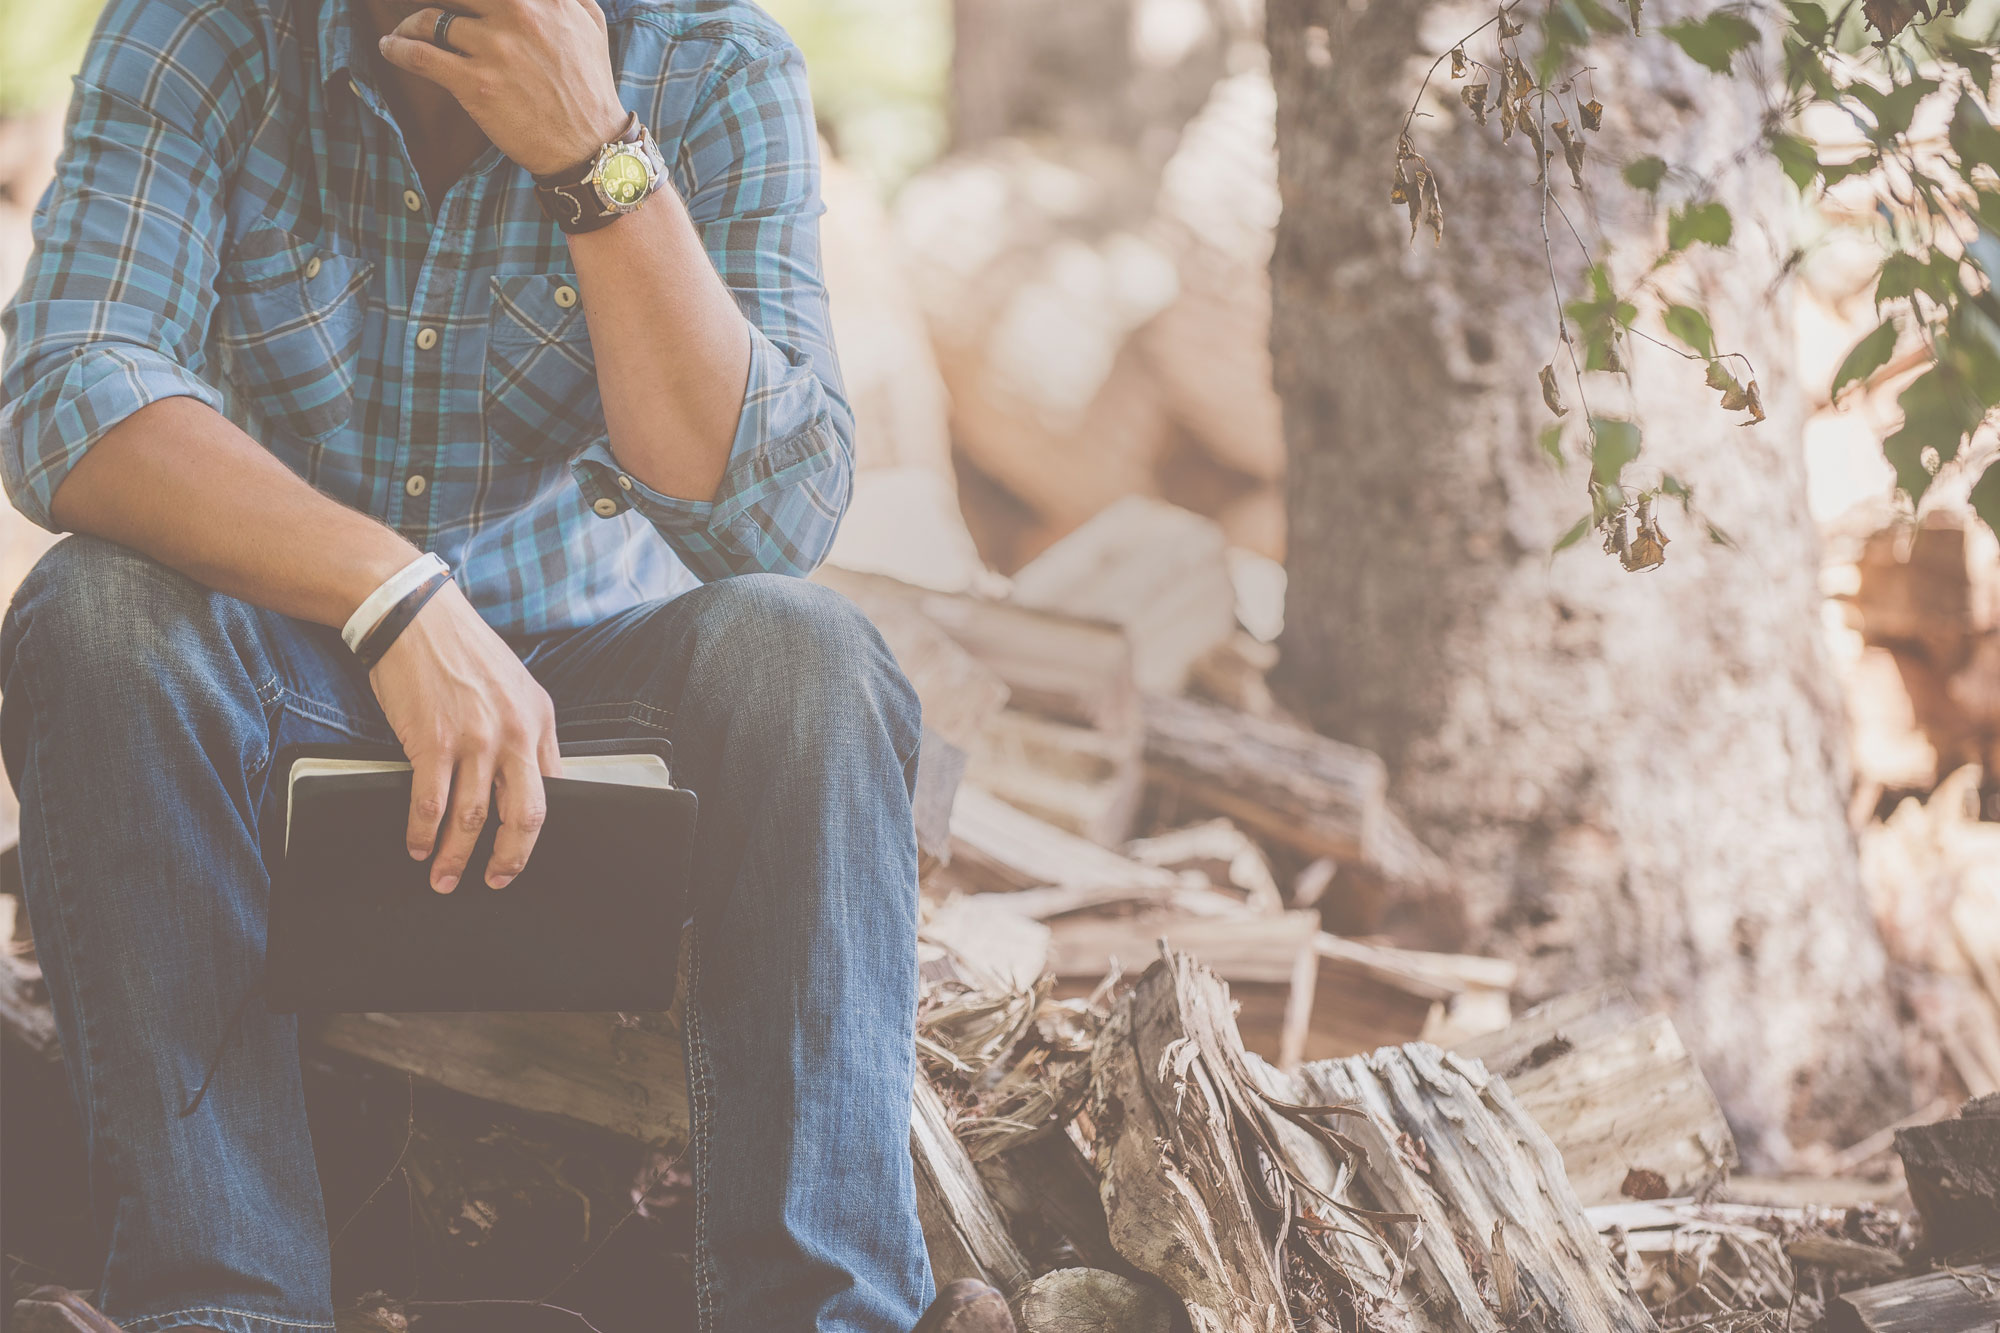 Prayer – Talking to God